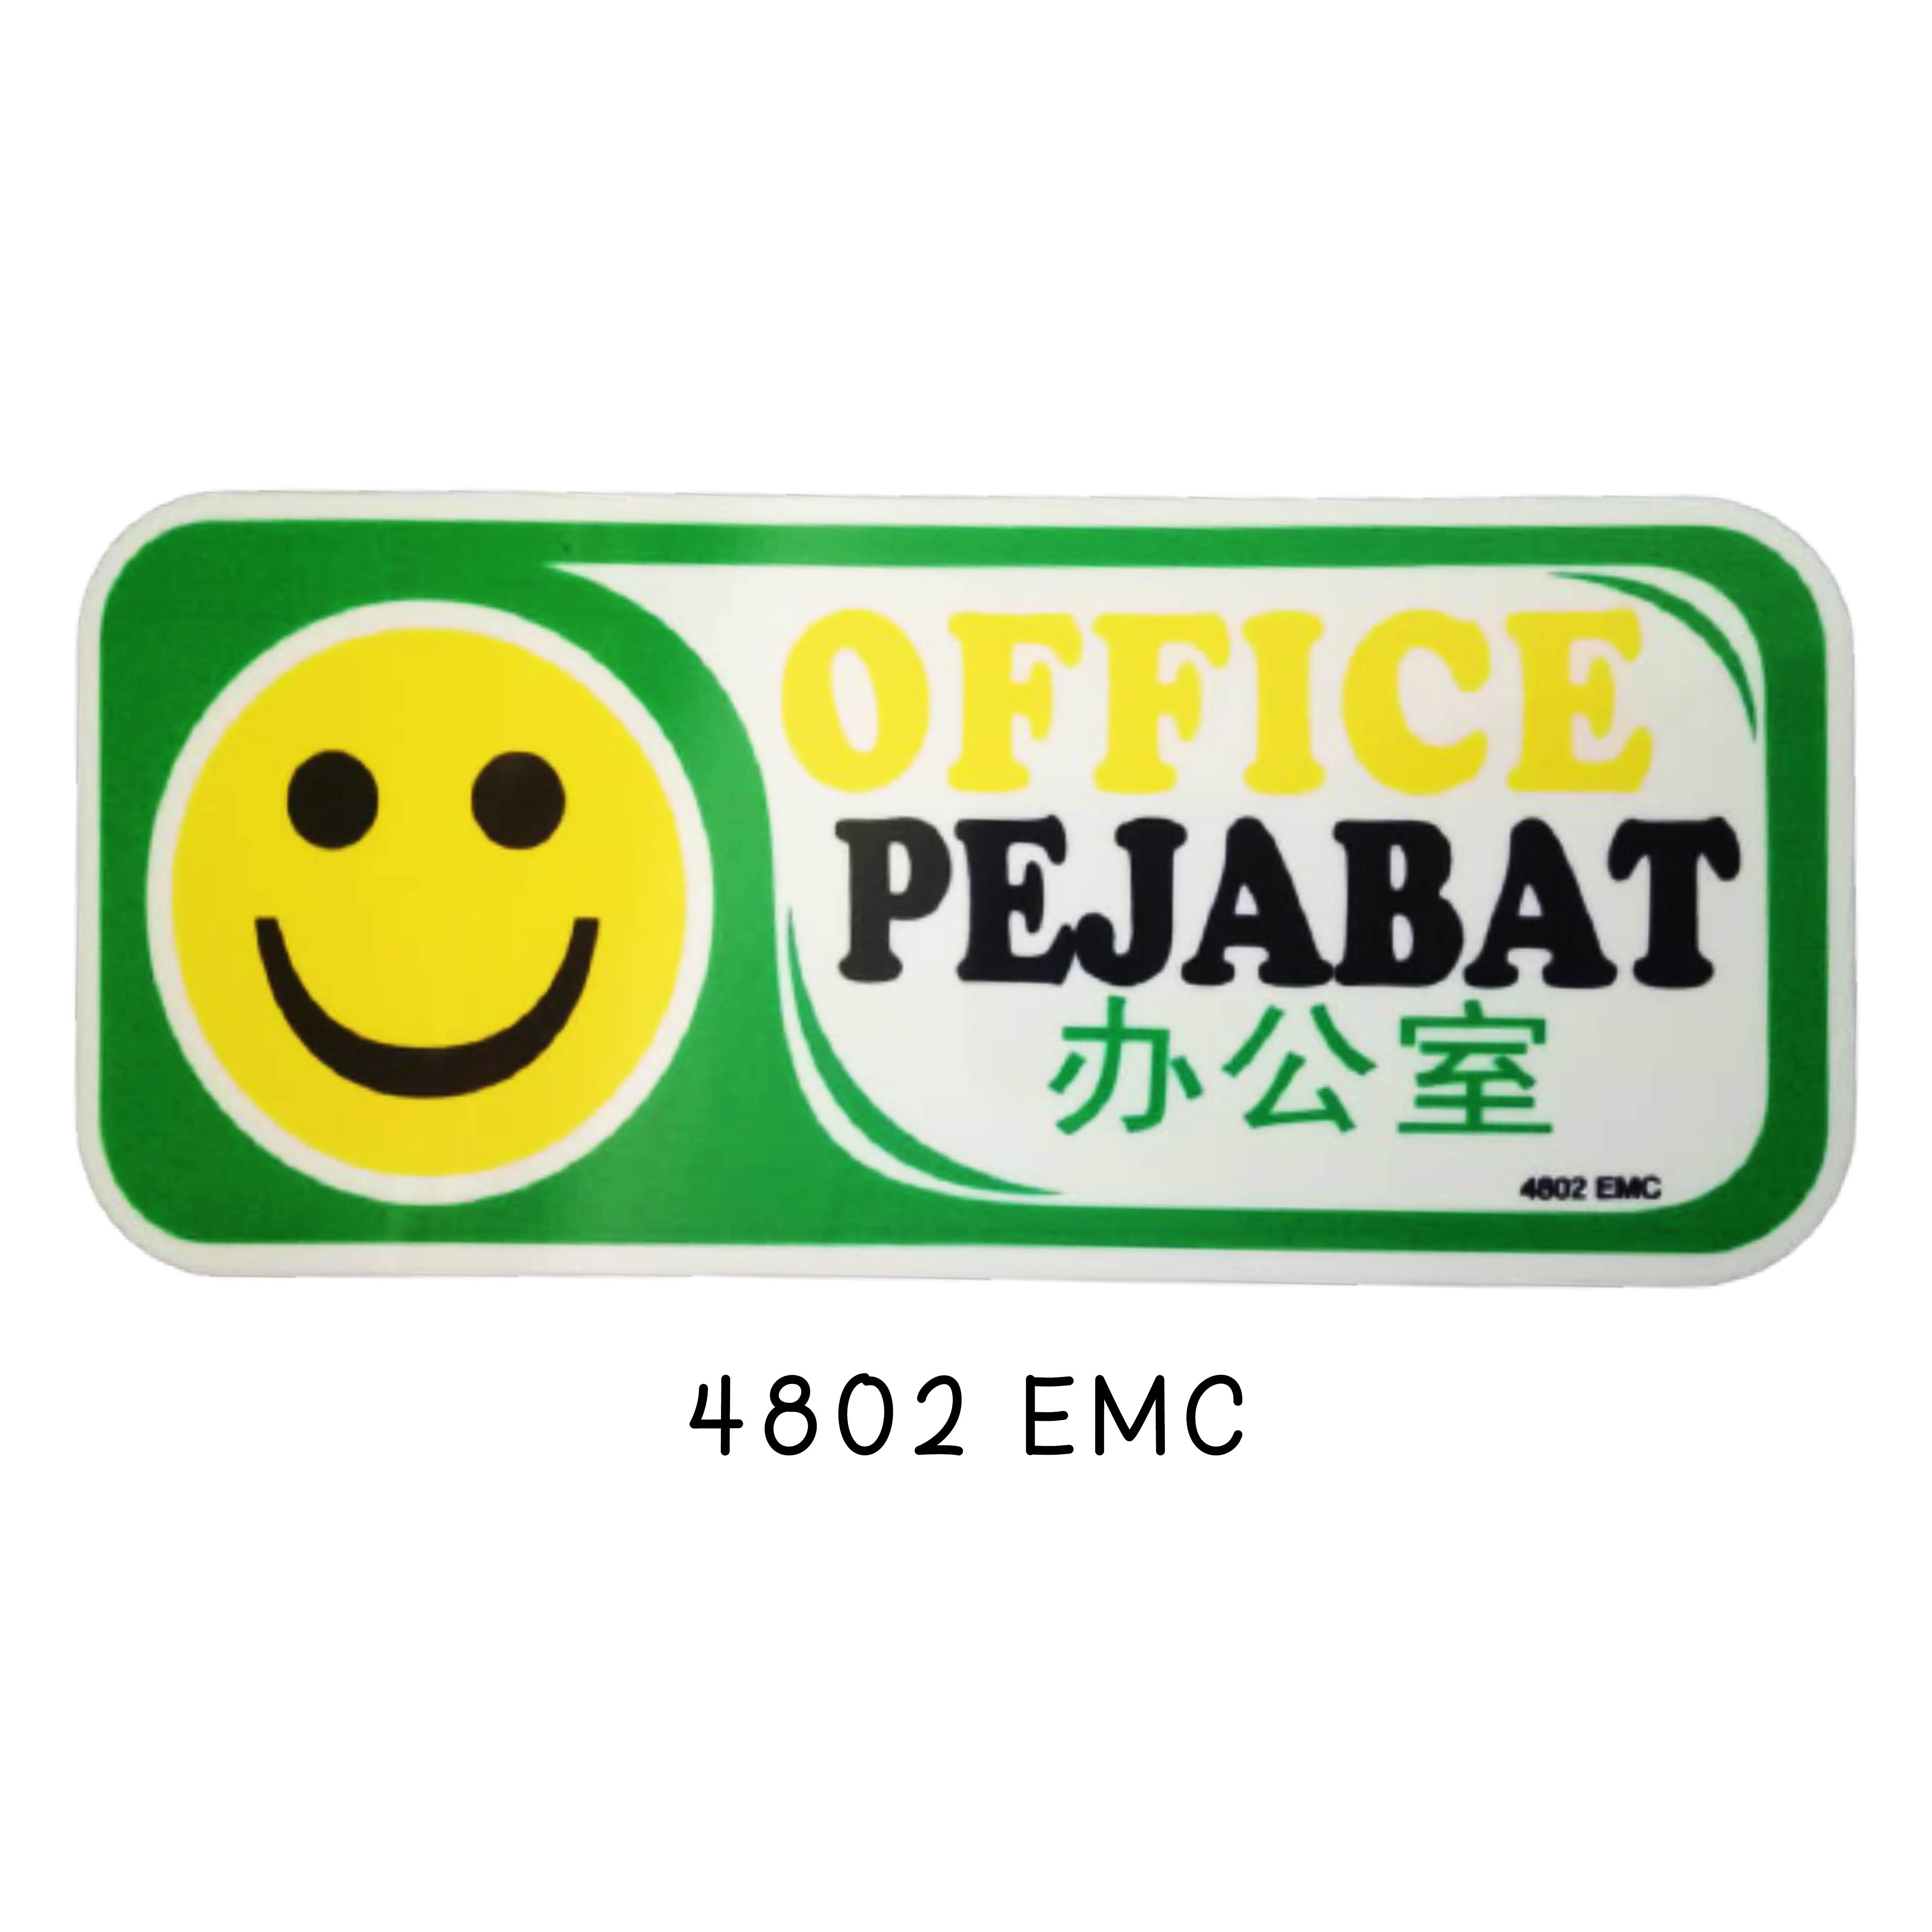 Sign Board 4802 EMC (OFFICE)